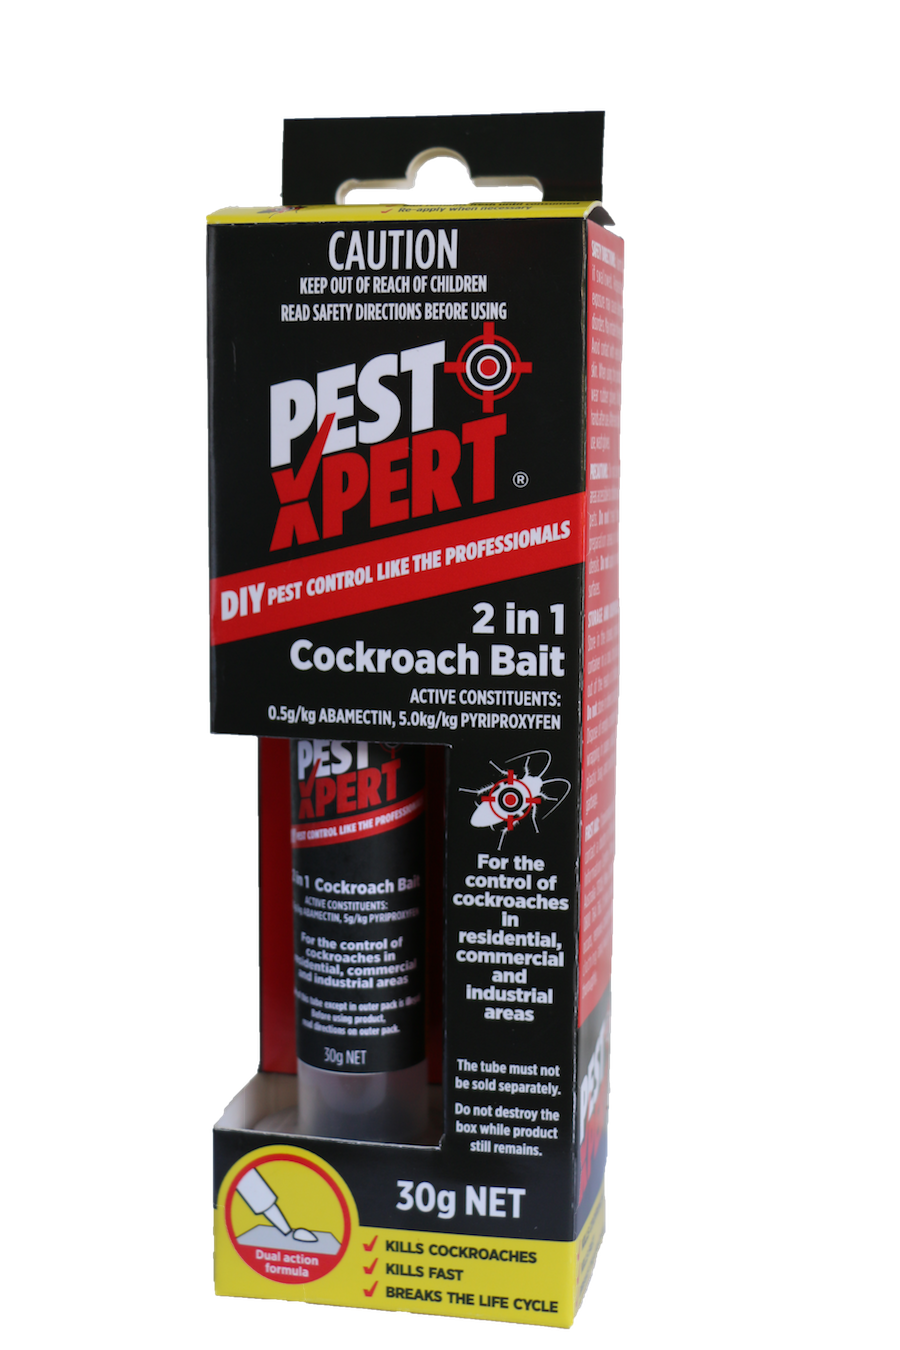 PestXpert 2 in 1 Cockroach Bait